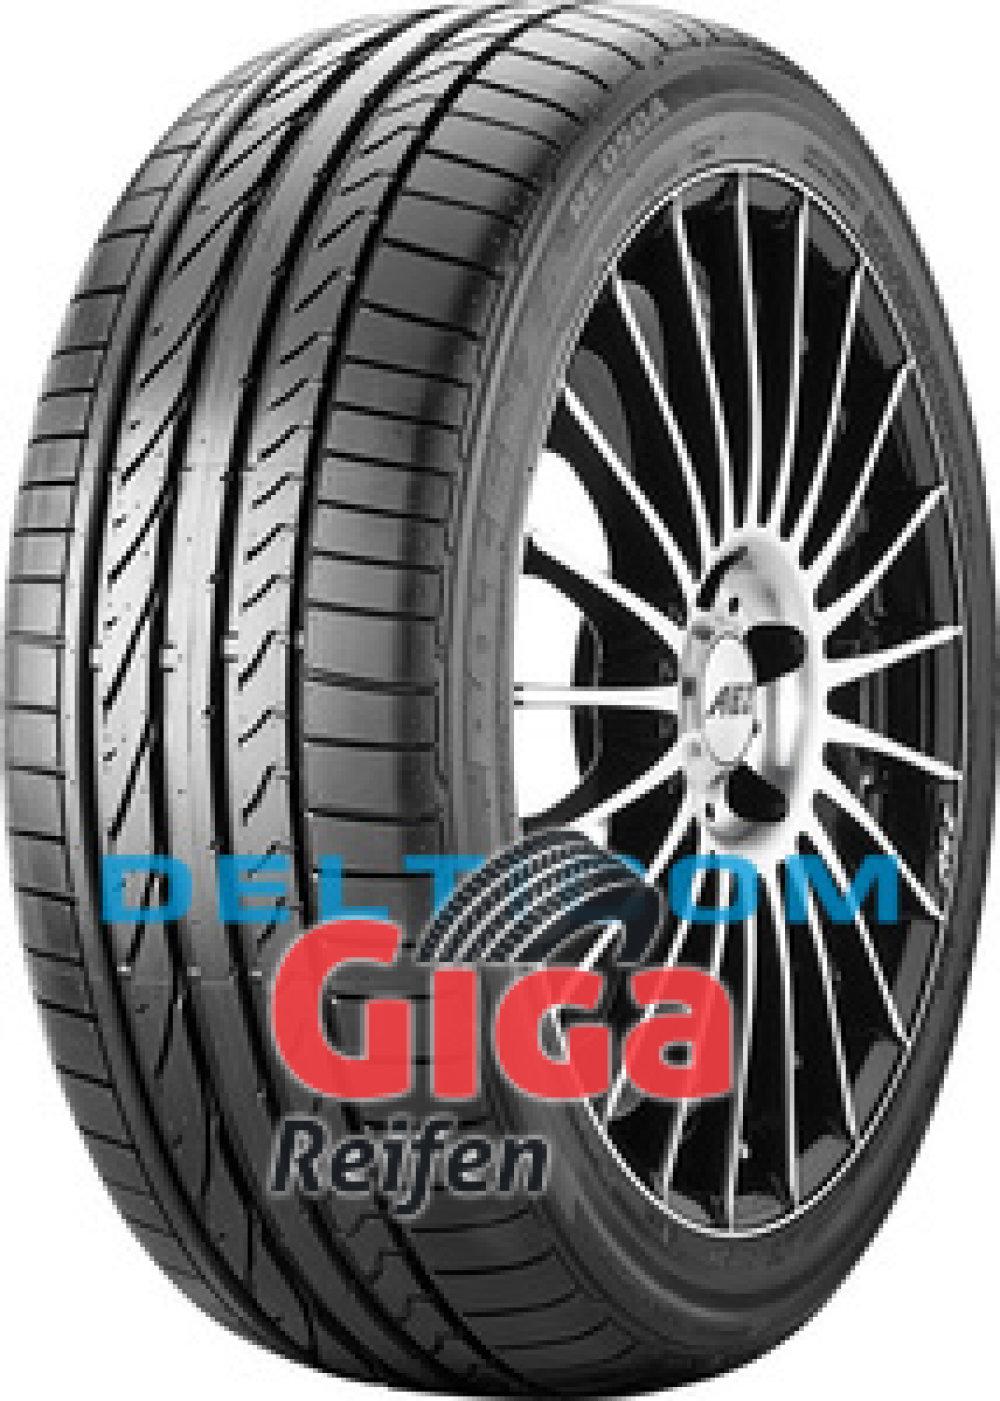 Bridgestone Potenza RE 050 A EXT ( 285/35 R18 97Y MOE, runflat, mit Felgenschutz (MFS) )